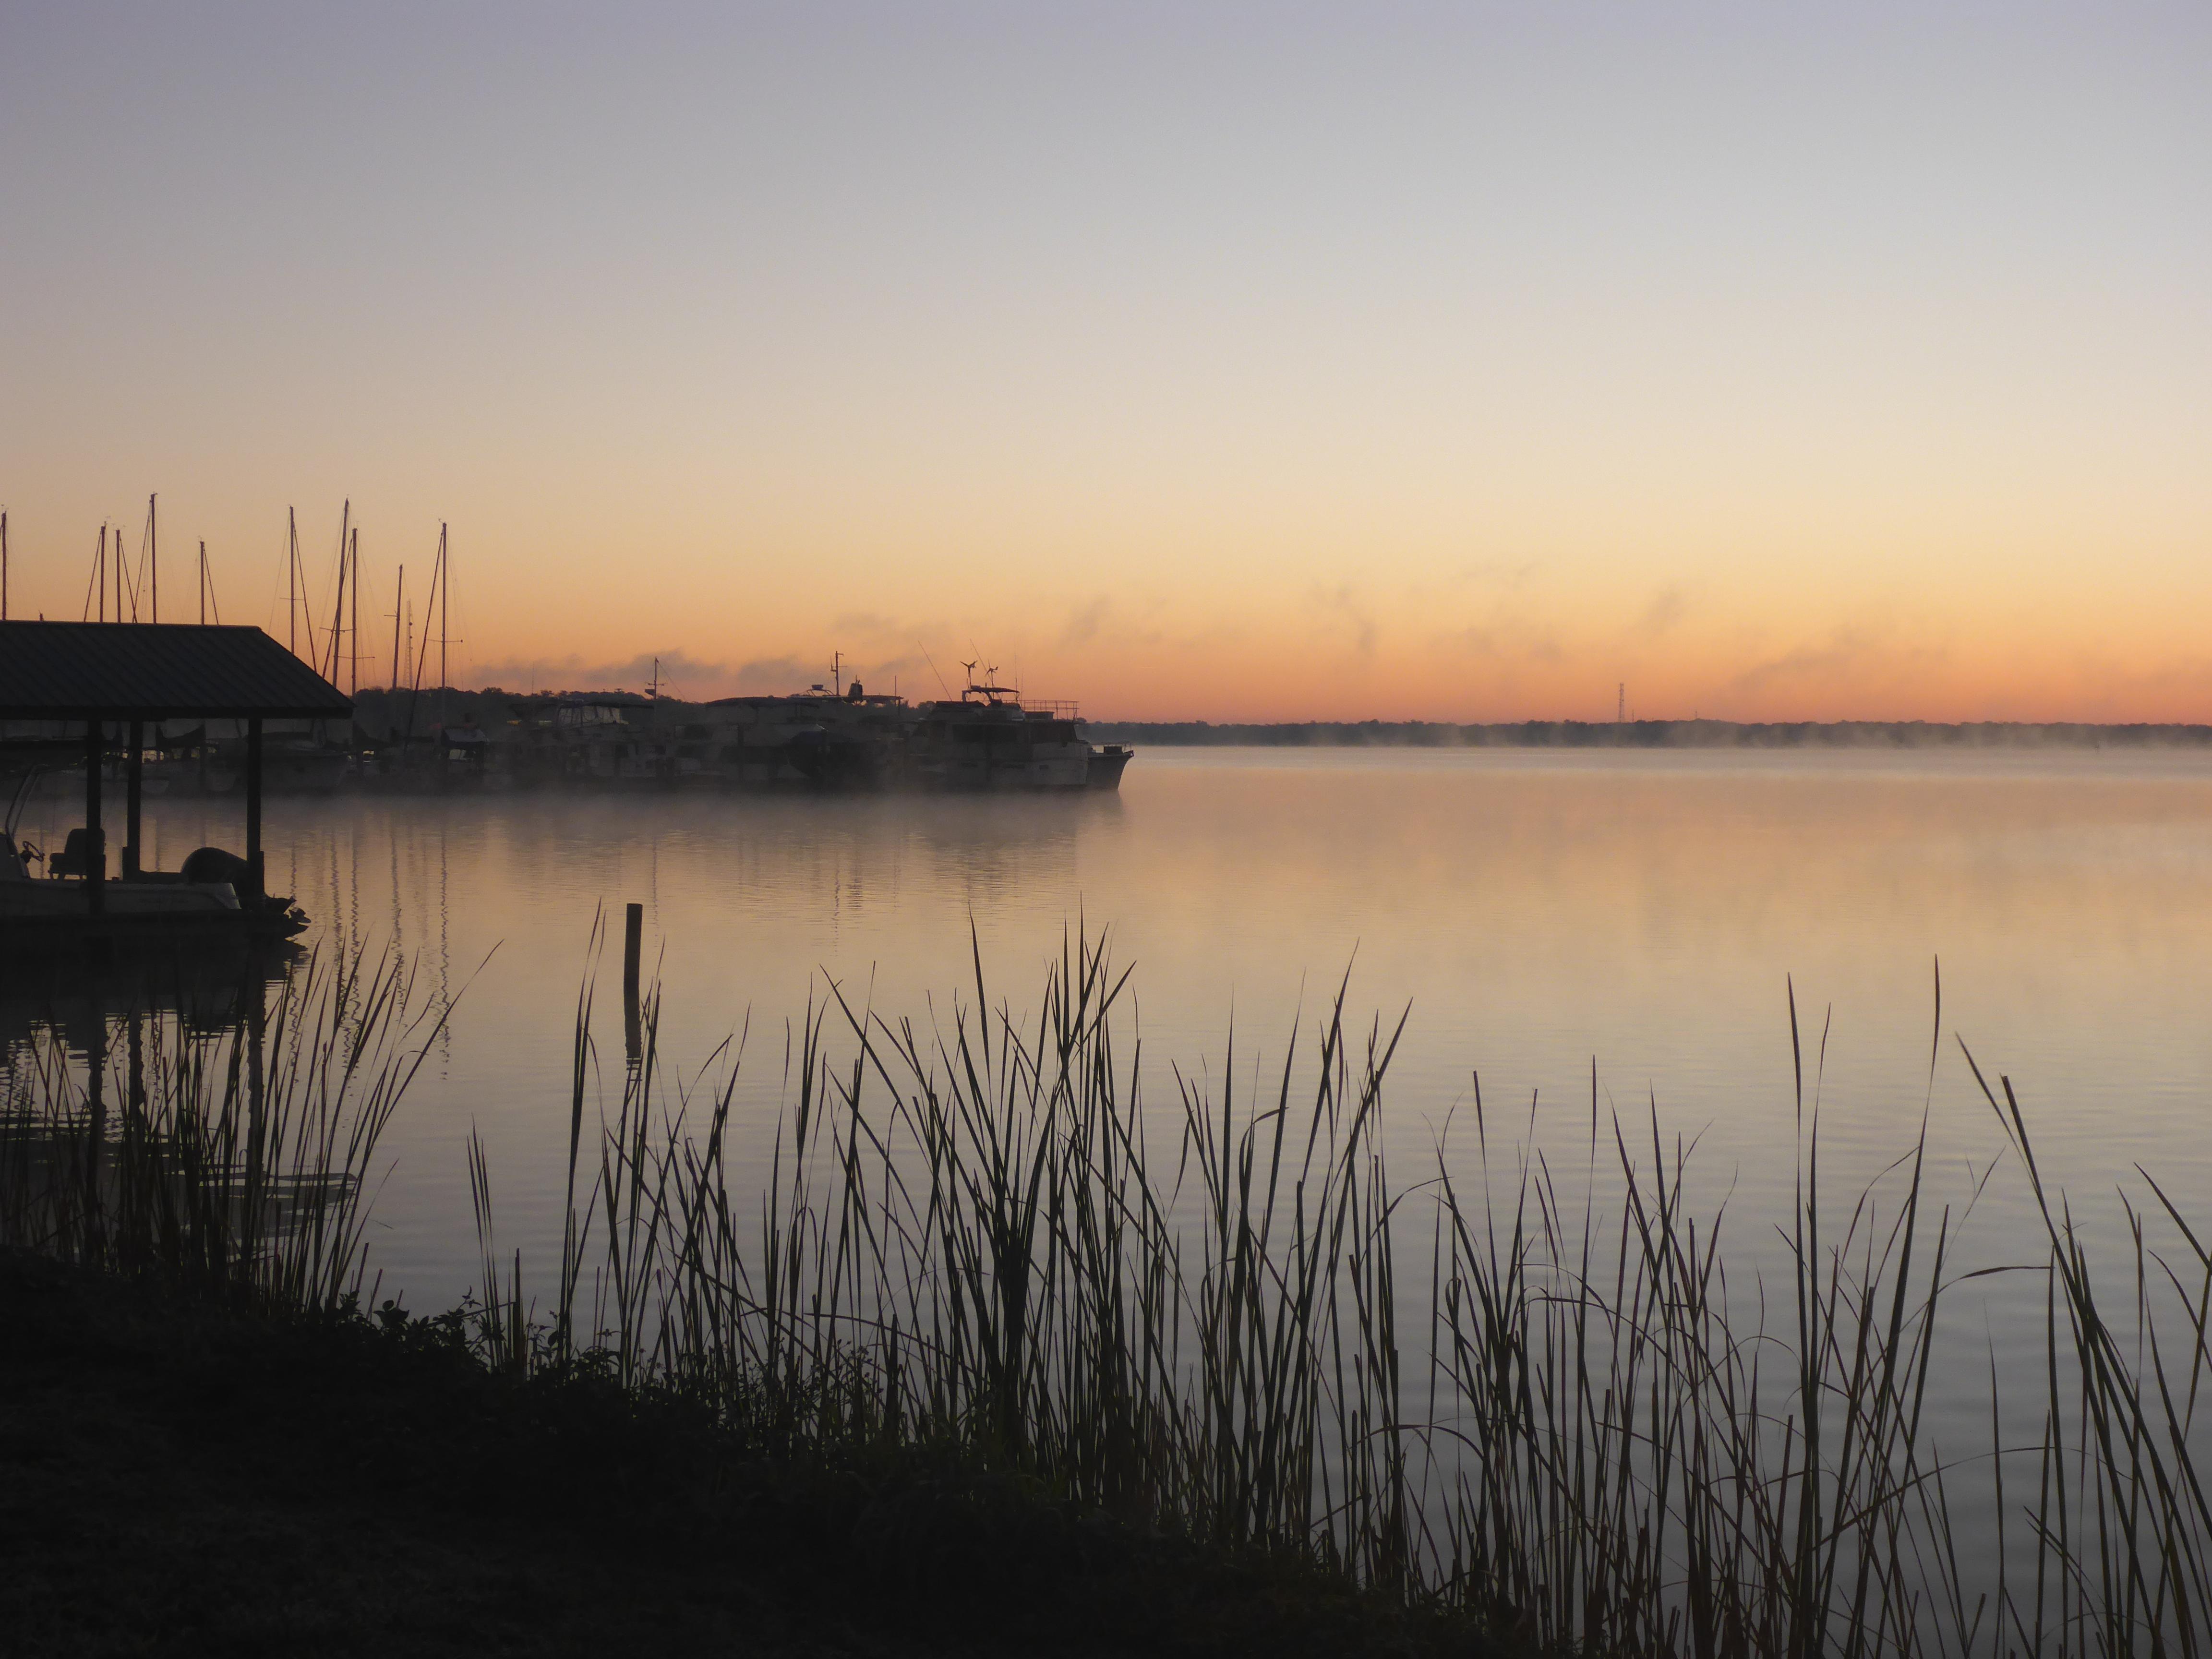 Sunrise over the St. Johns